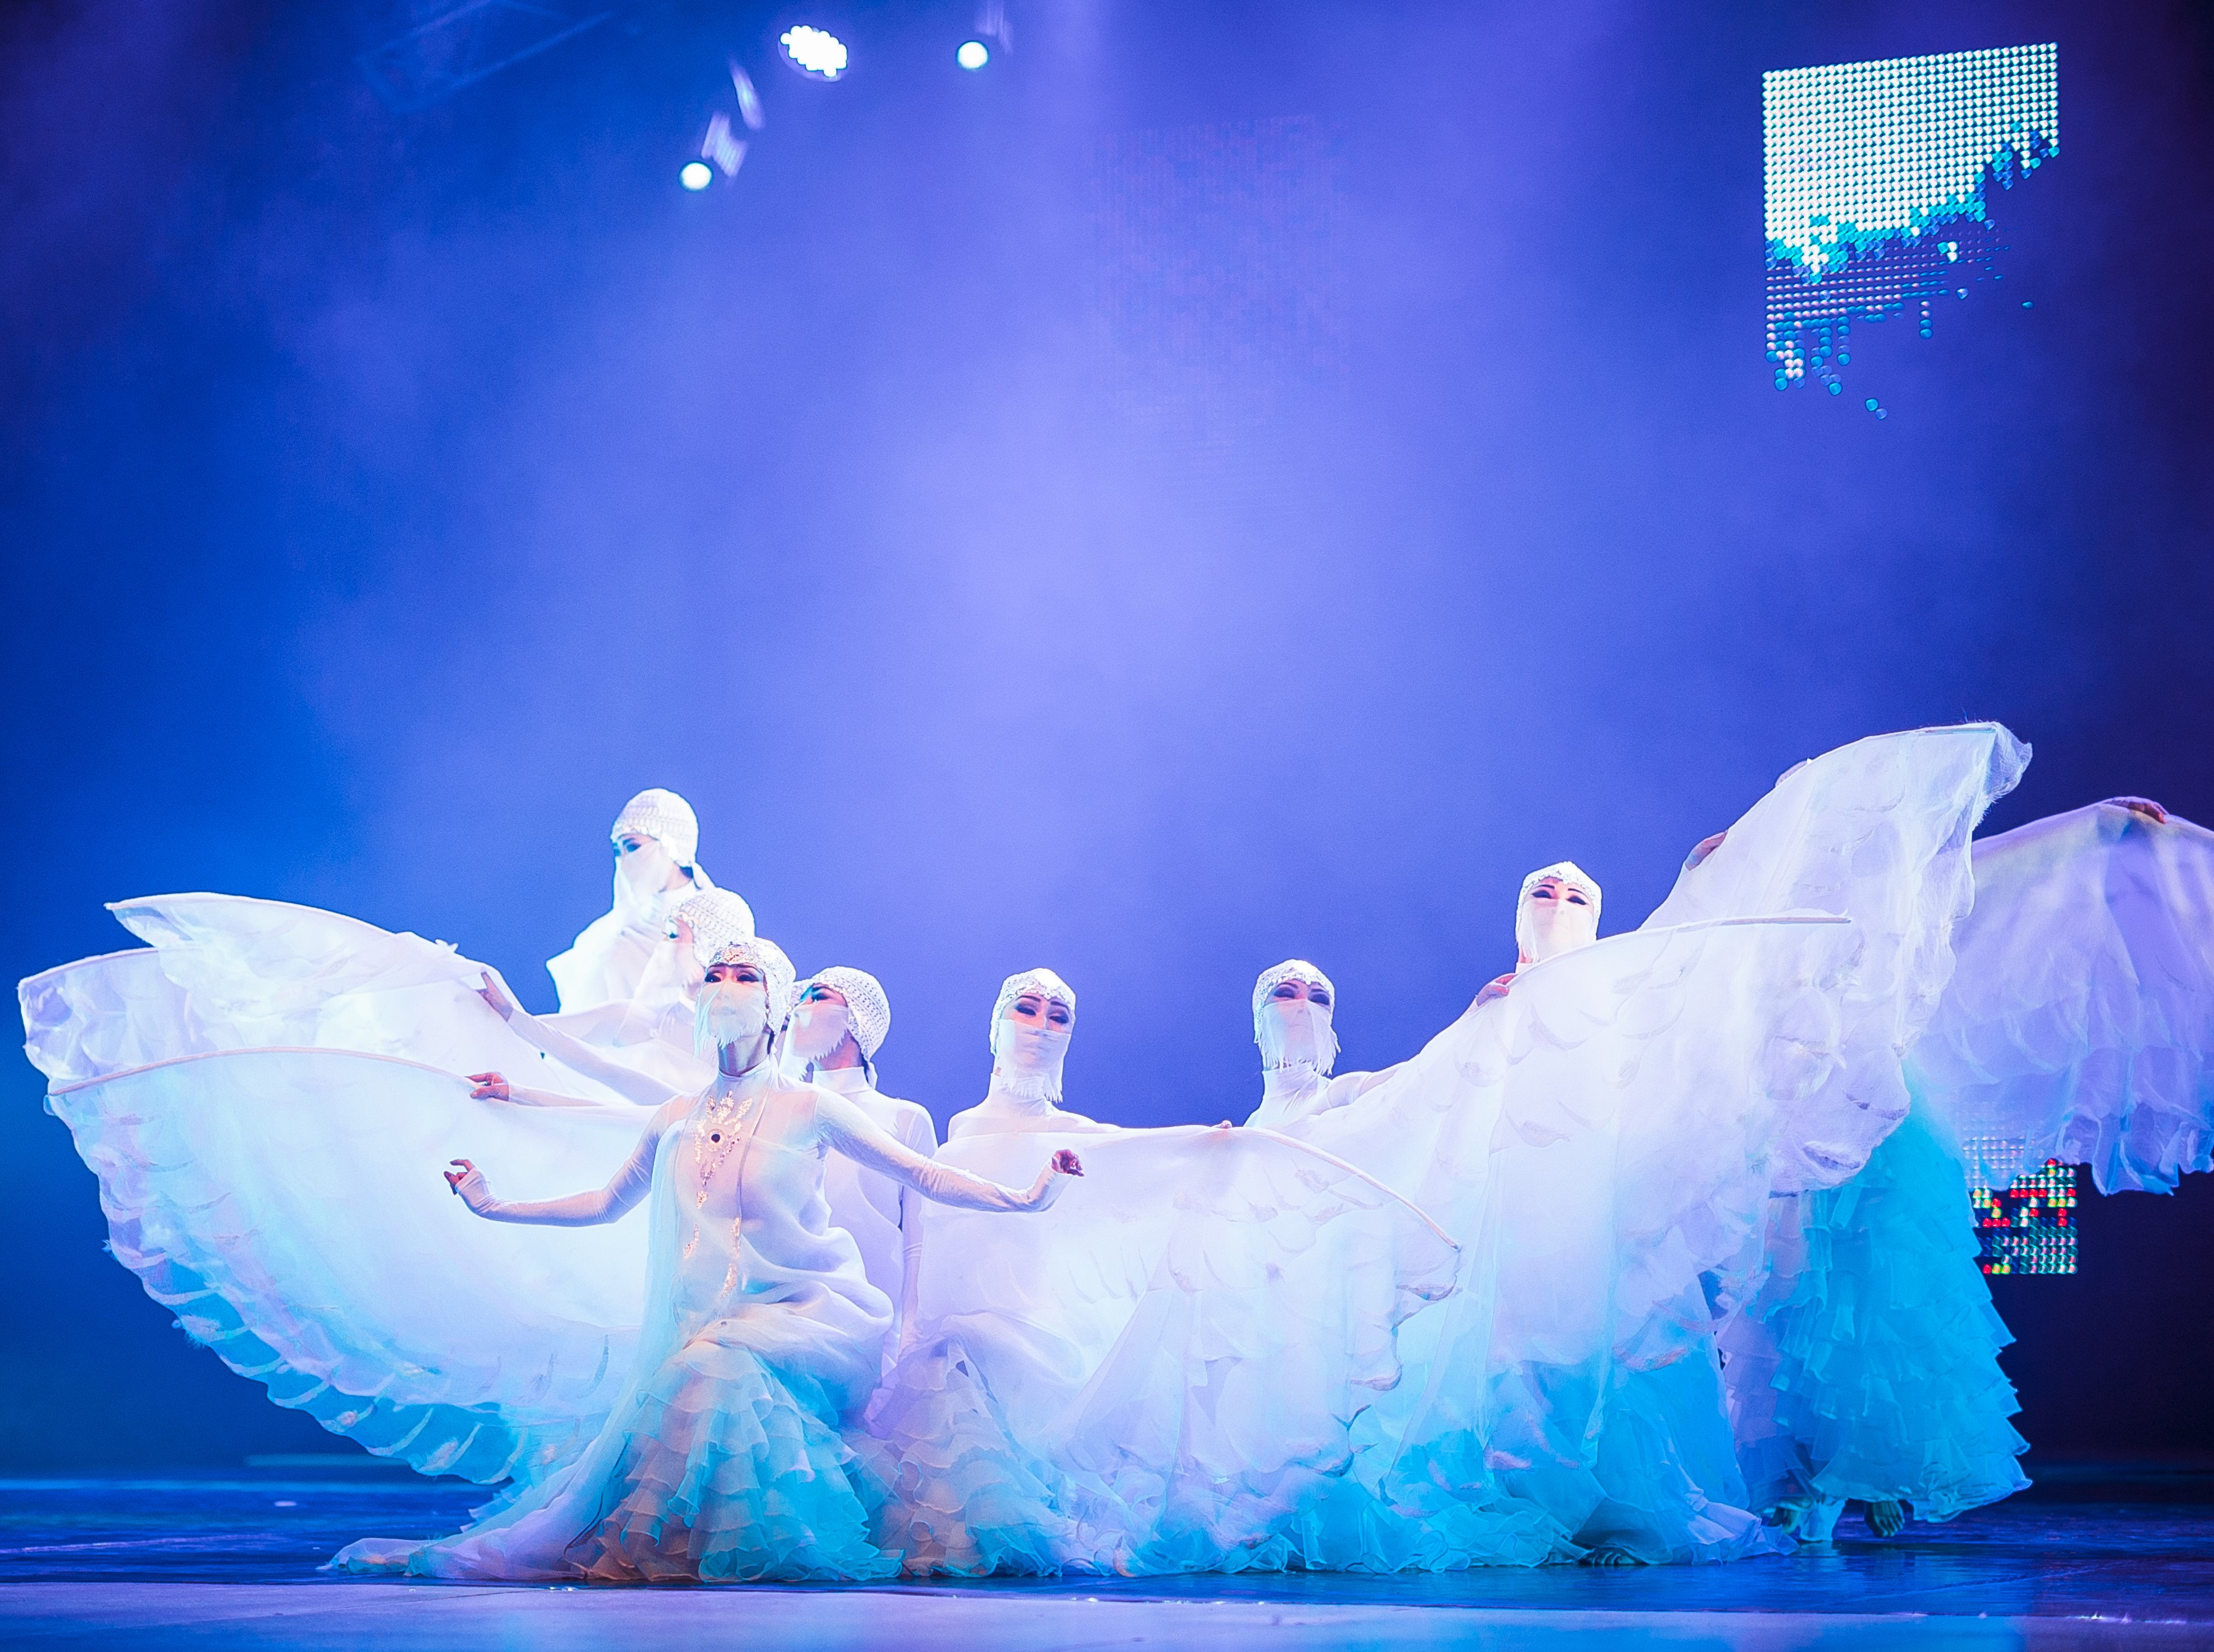 бурятский театр песни и танца Байкал